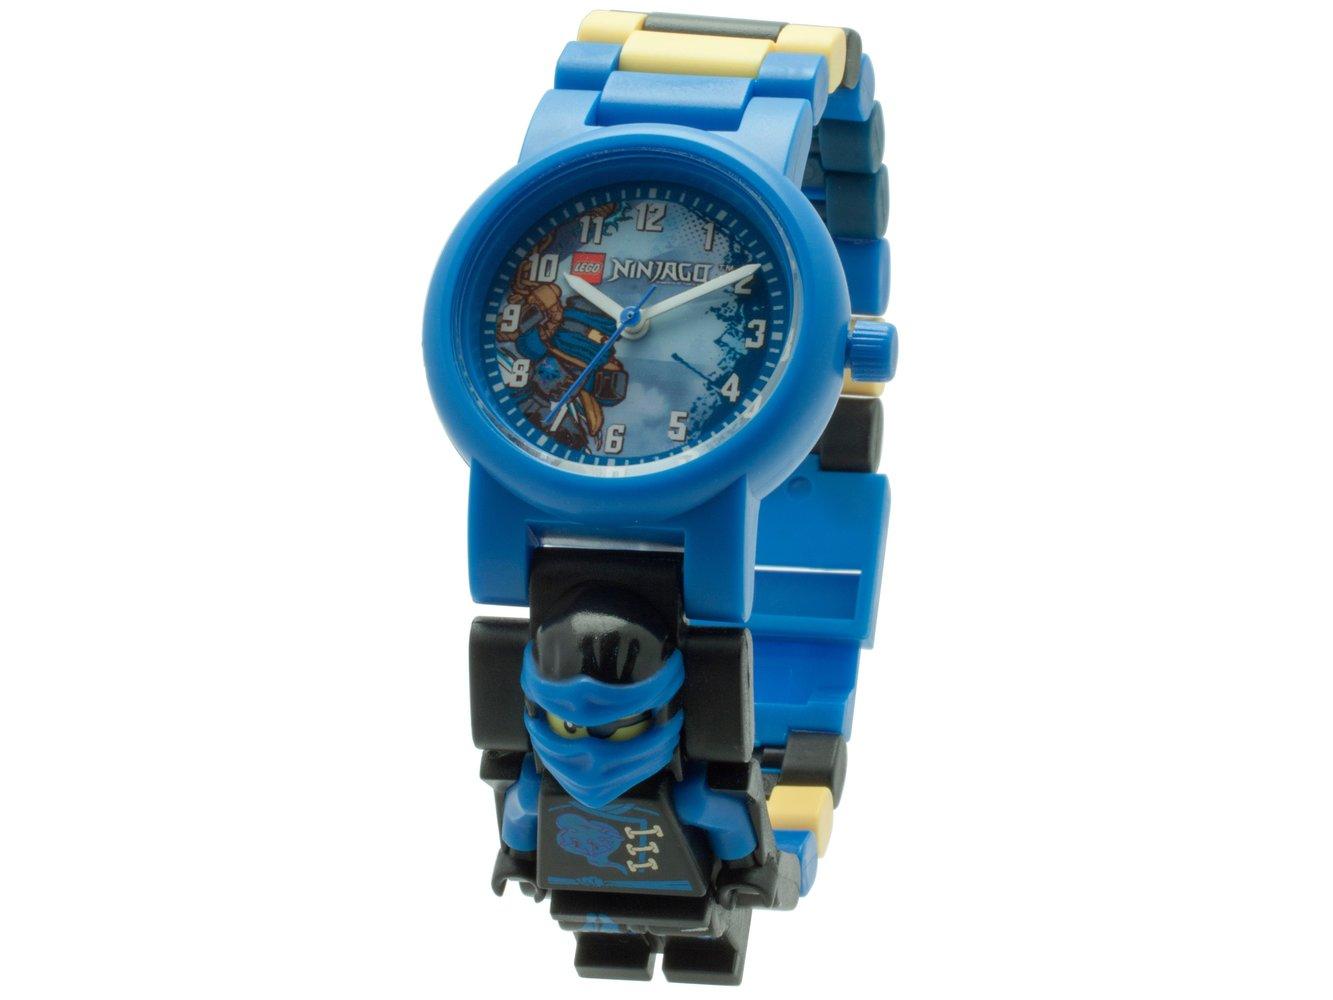 Jay Minifigure Link Watch